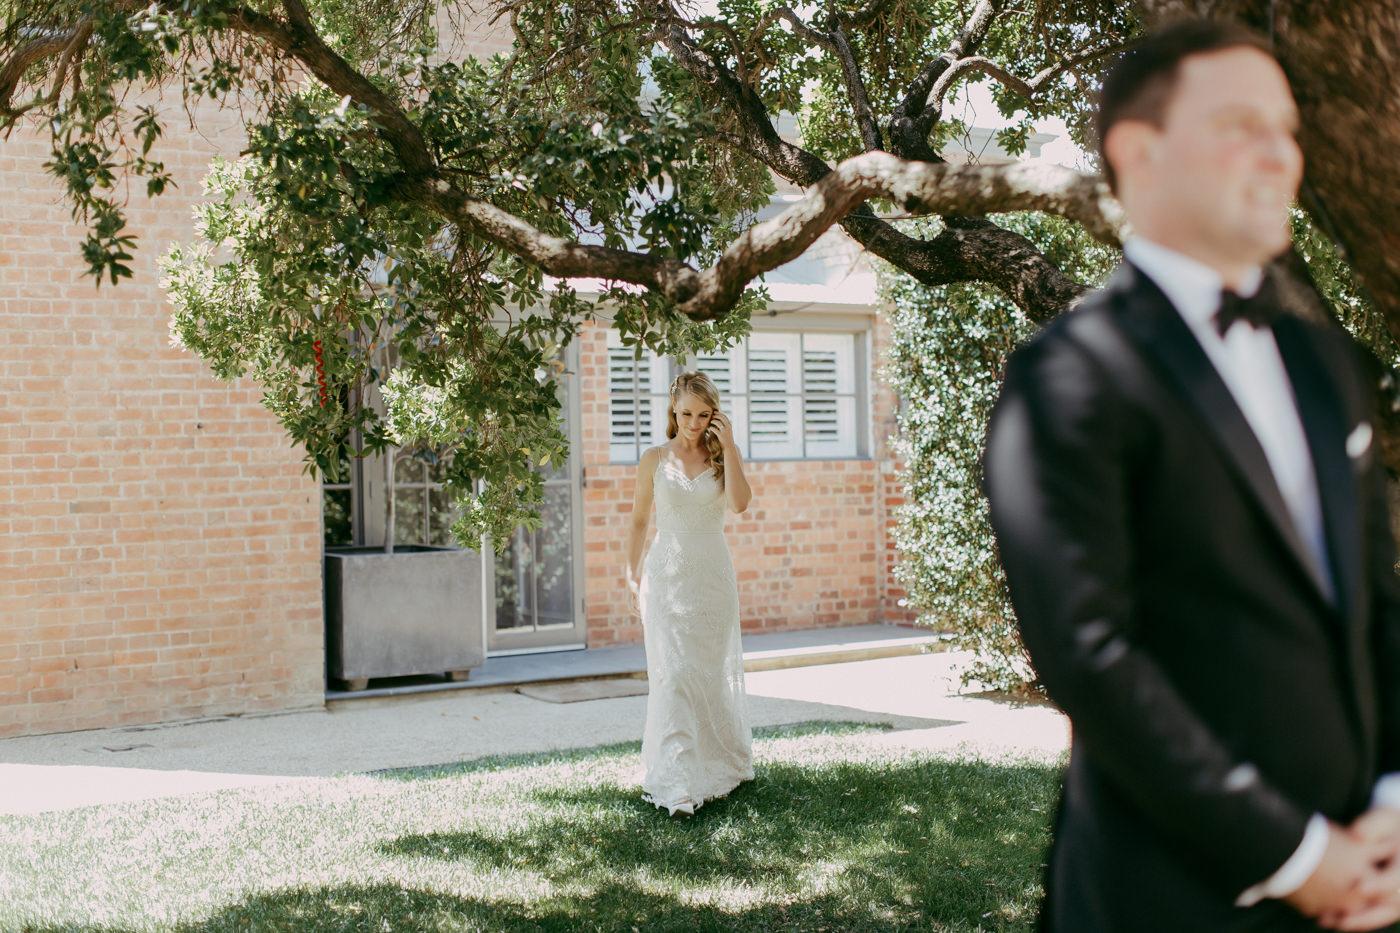 Anthony & Eliet - Wagga Wagga Wedding - Country NSW - Samantha Heather Photography-34.jpg